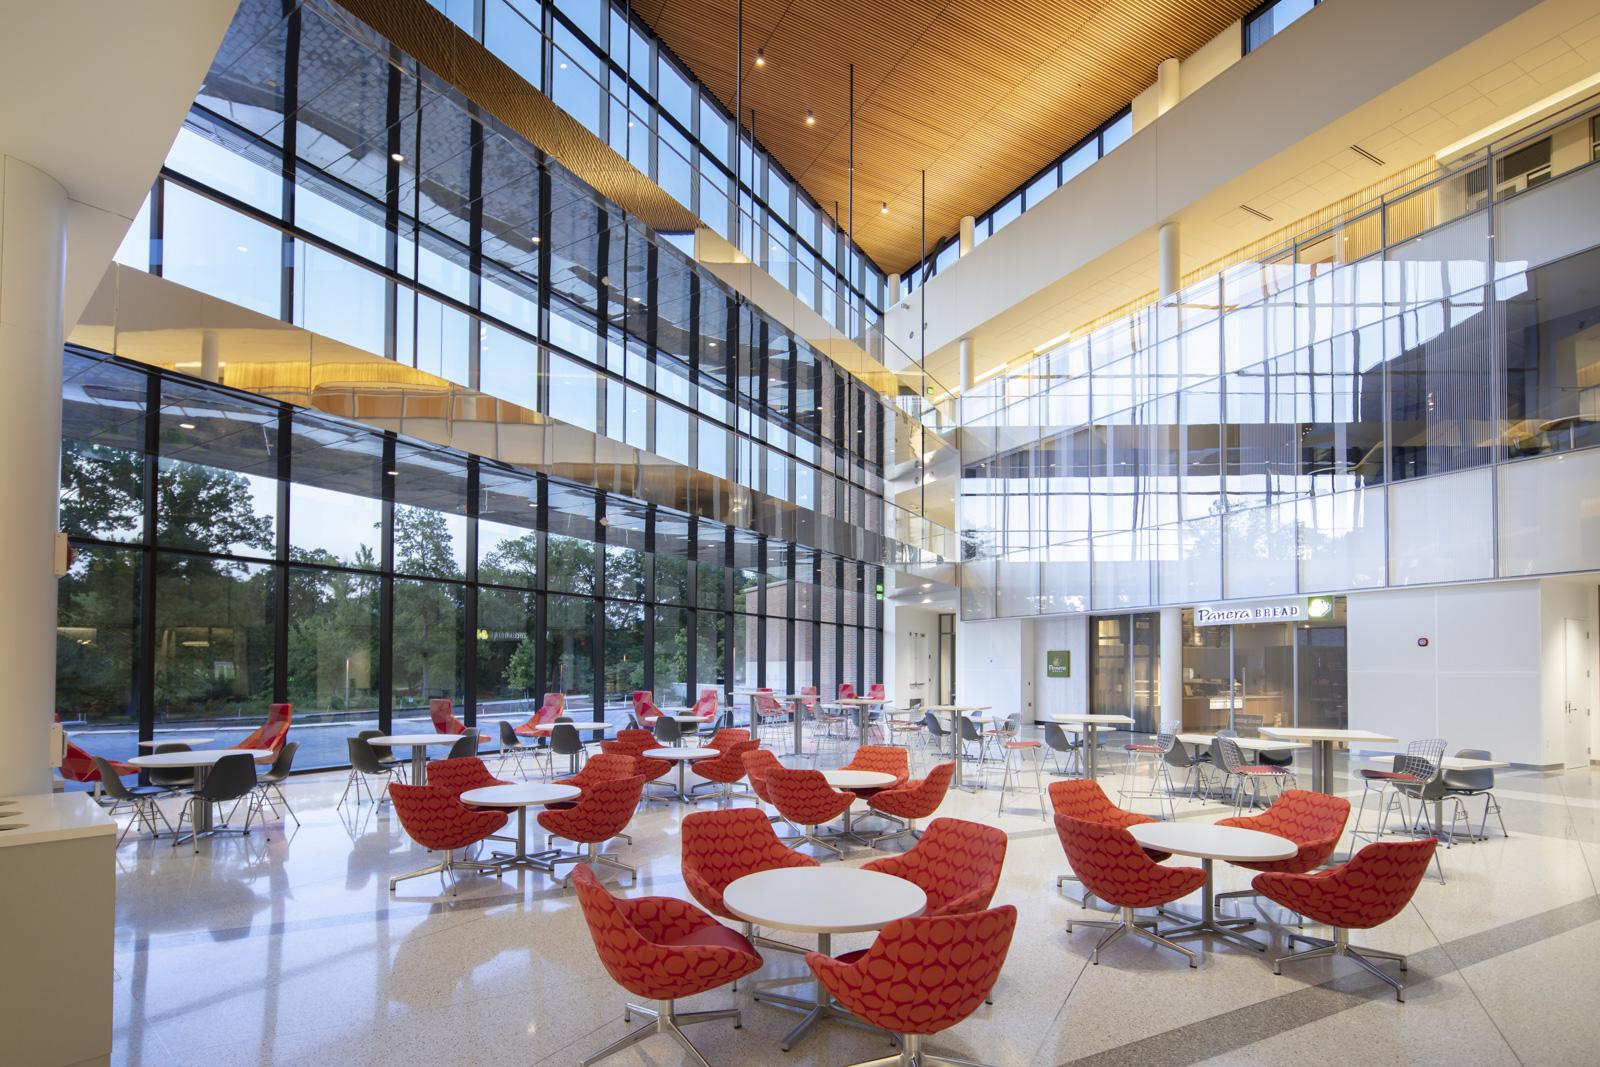 Inside MSU Minskoff Pavilion